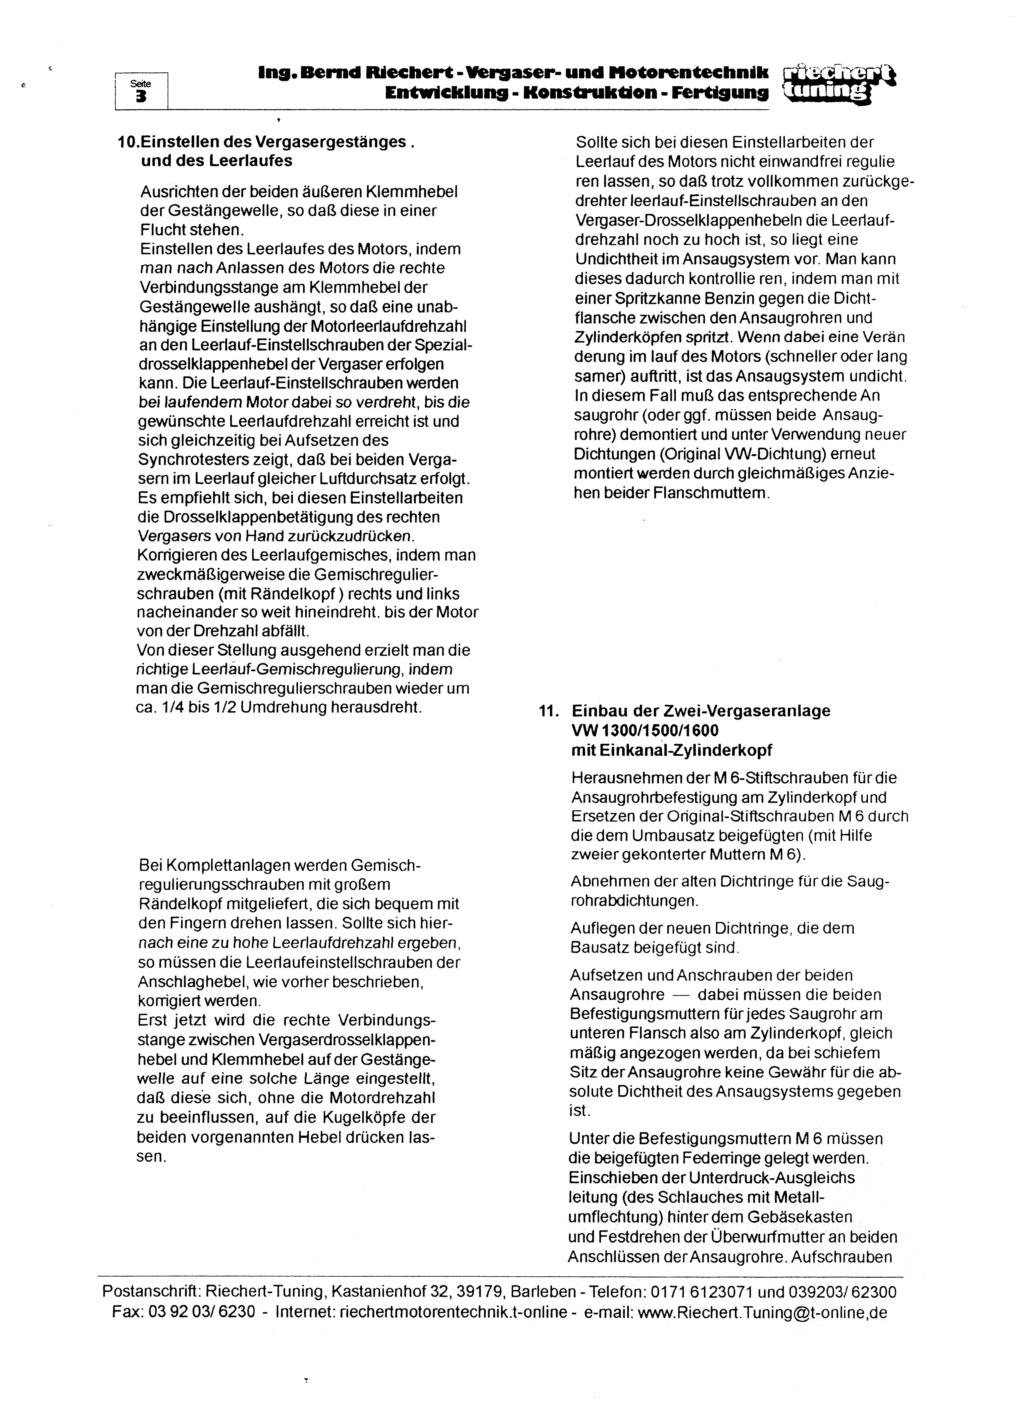 Documentation kit Riechert 3rd_pa10